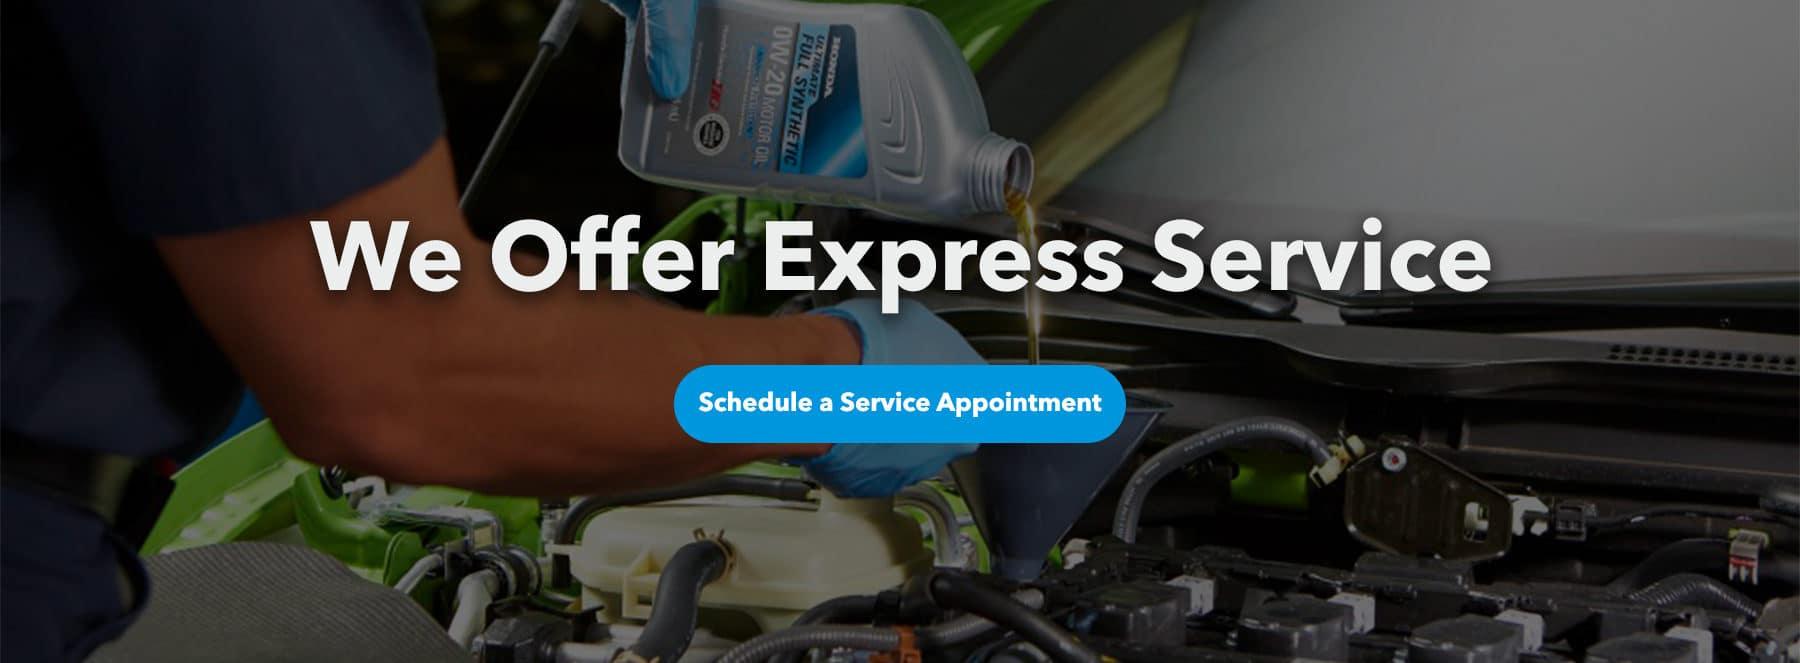 We Offer Express Service